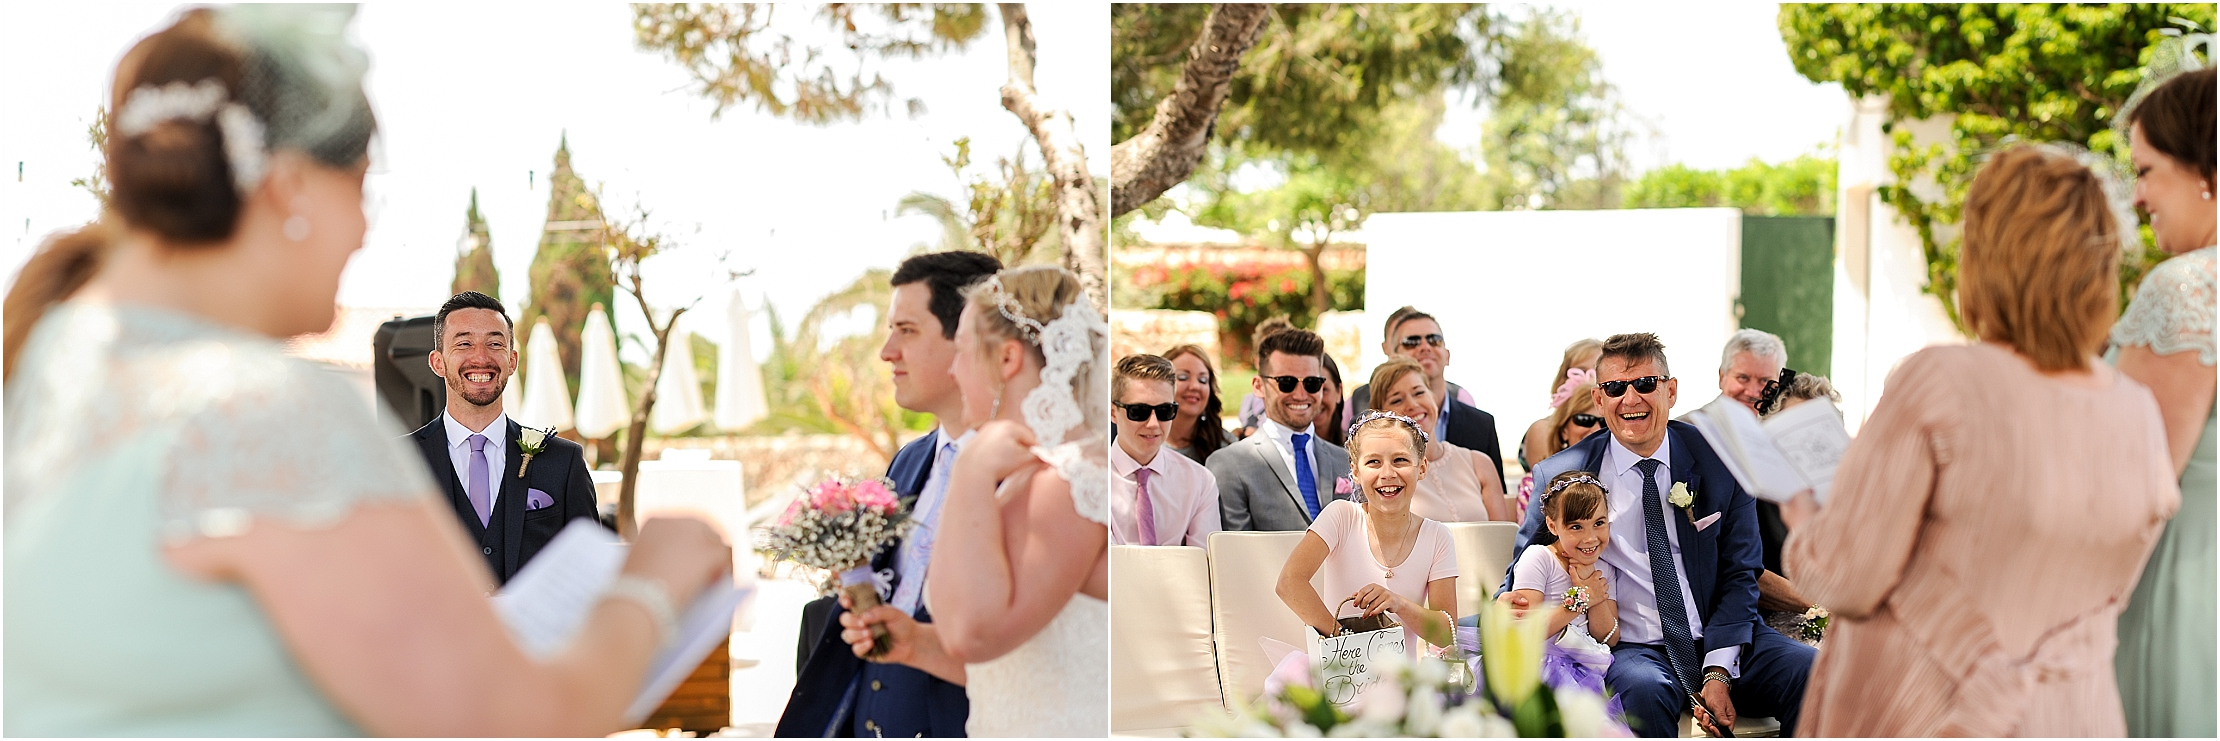 menorca-wedding - 088.jpg